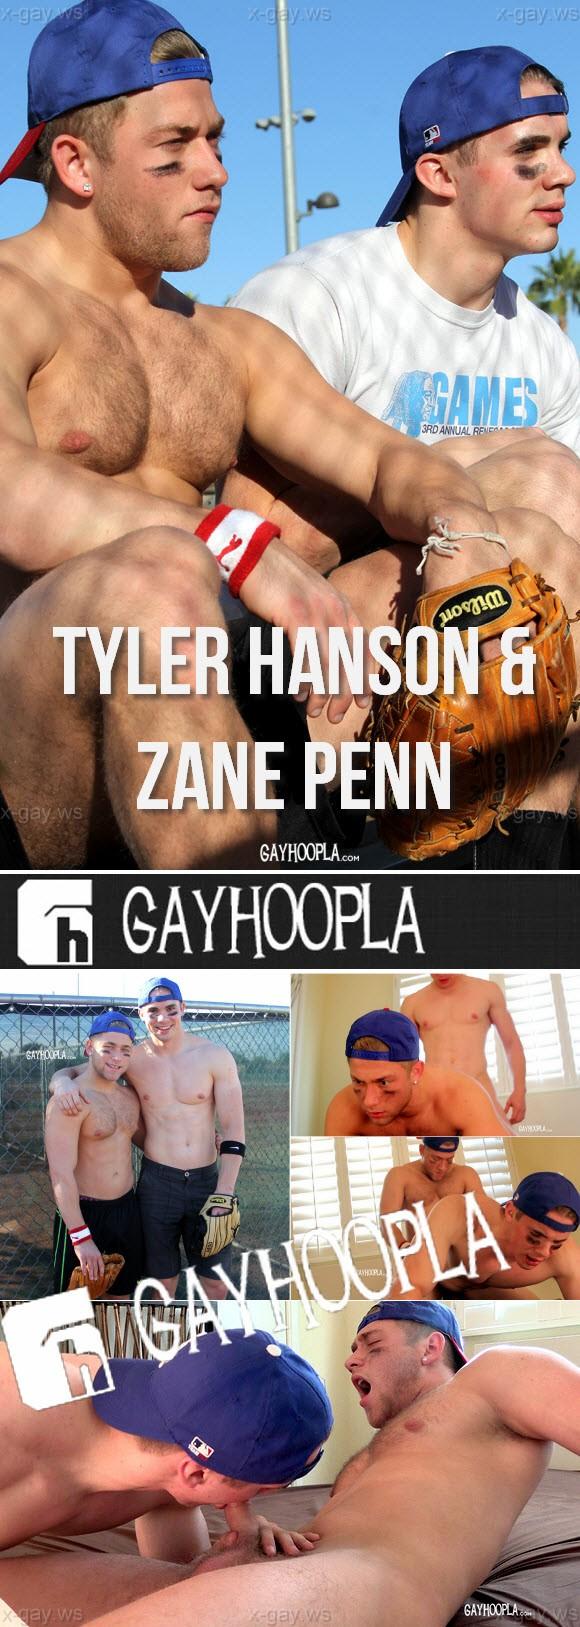 GayHoopla – Tyler Hanson & Zane Penn, Flip-Flop